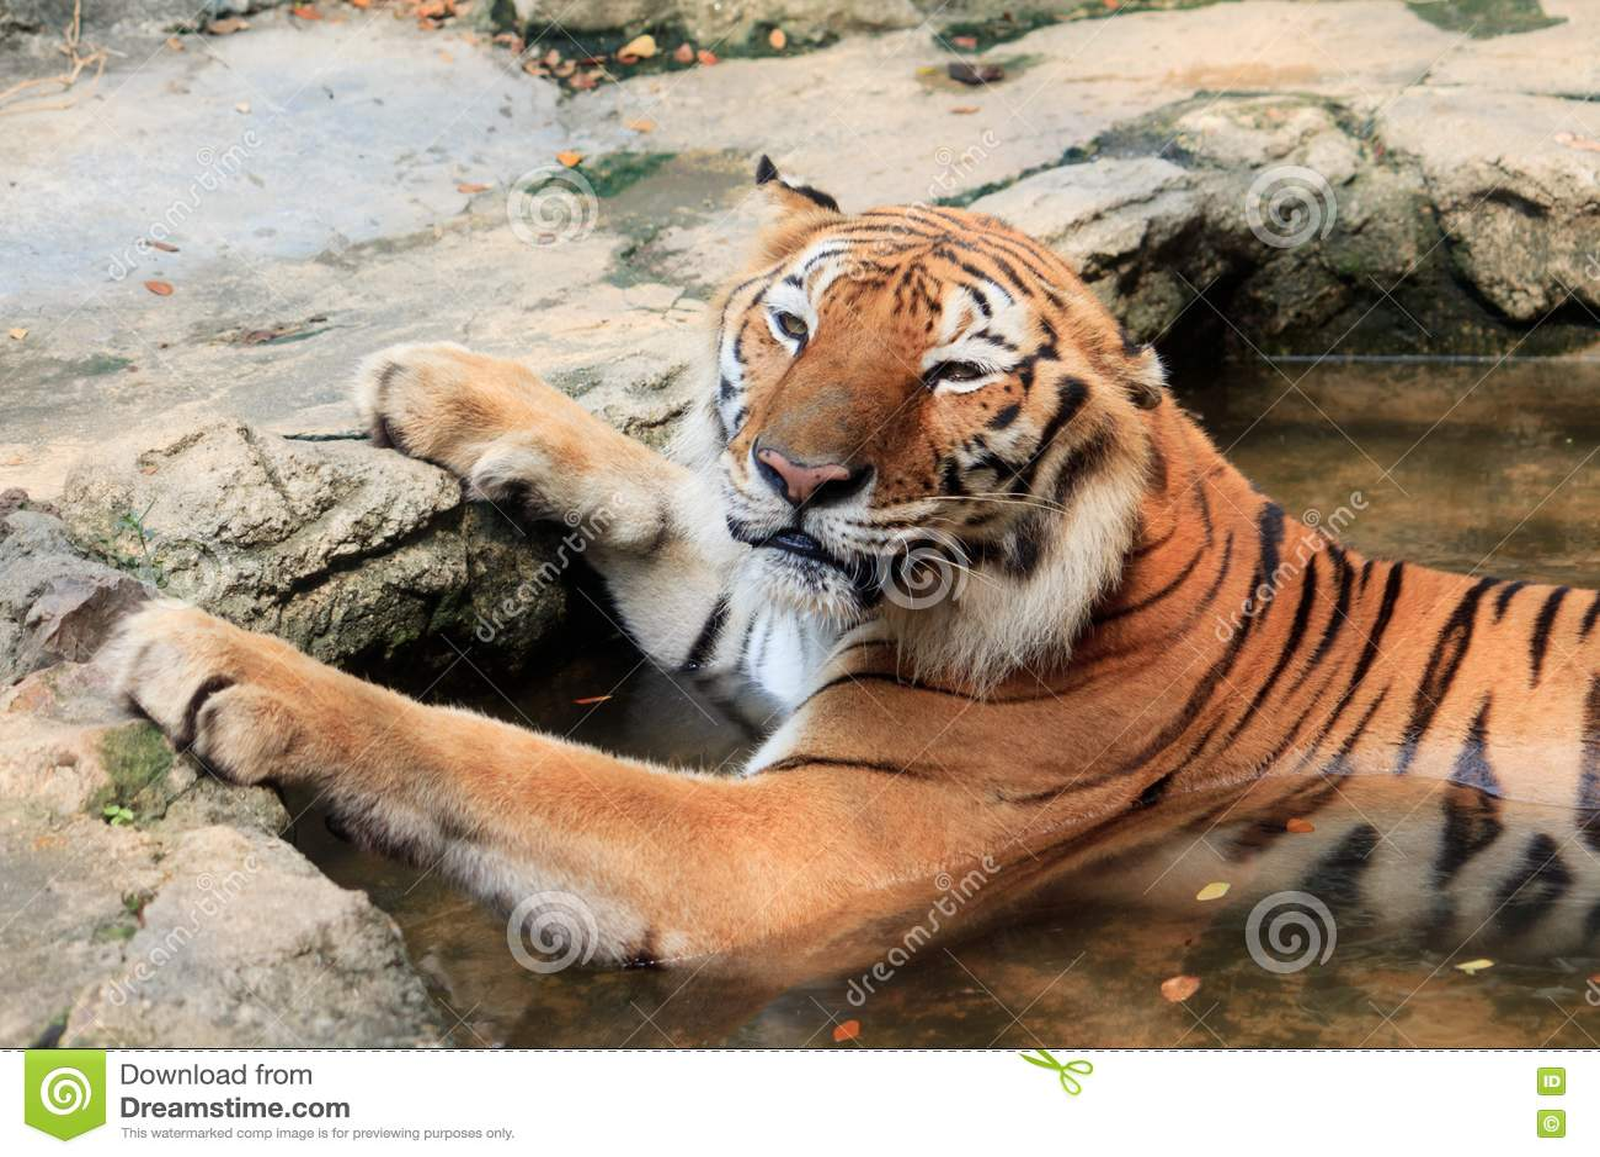 Bengal Tiger Take A Bath Look Cute Royalty Free Stock ...